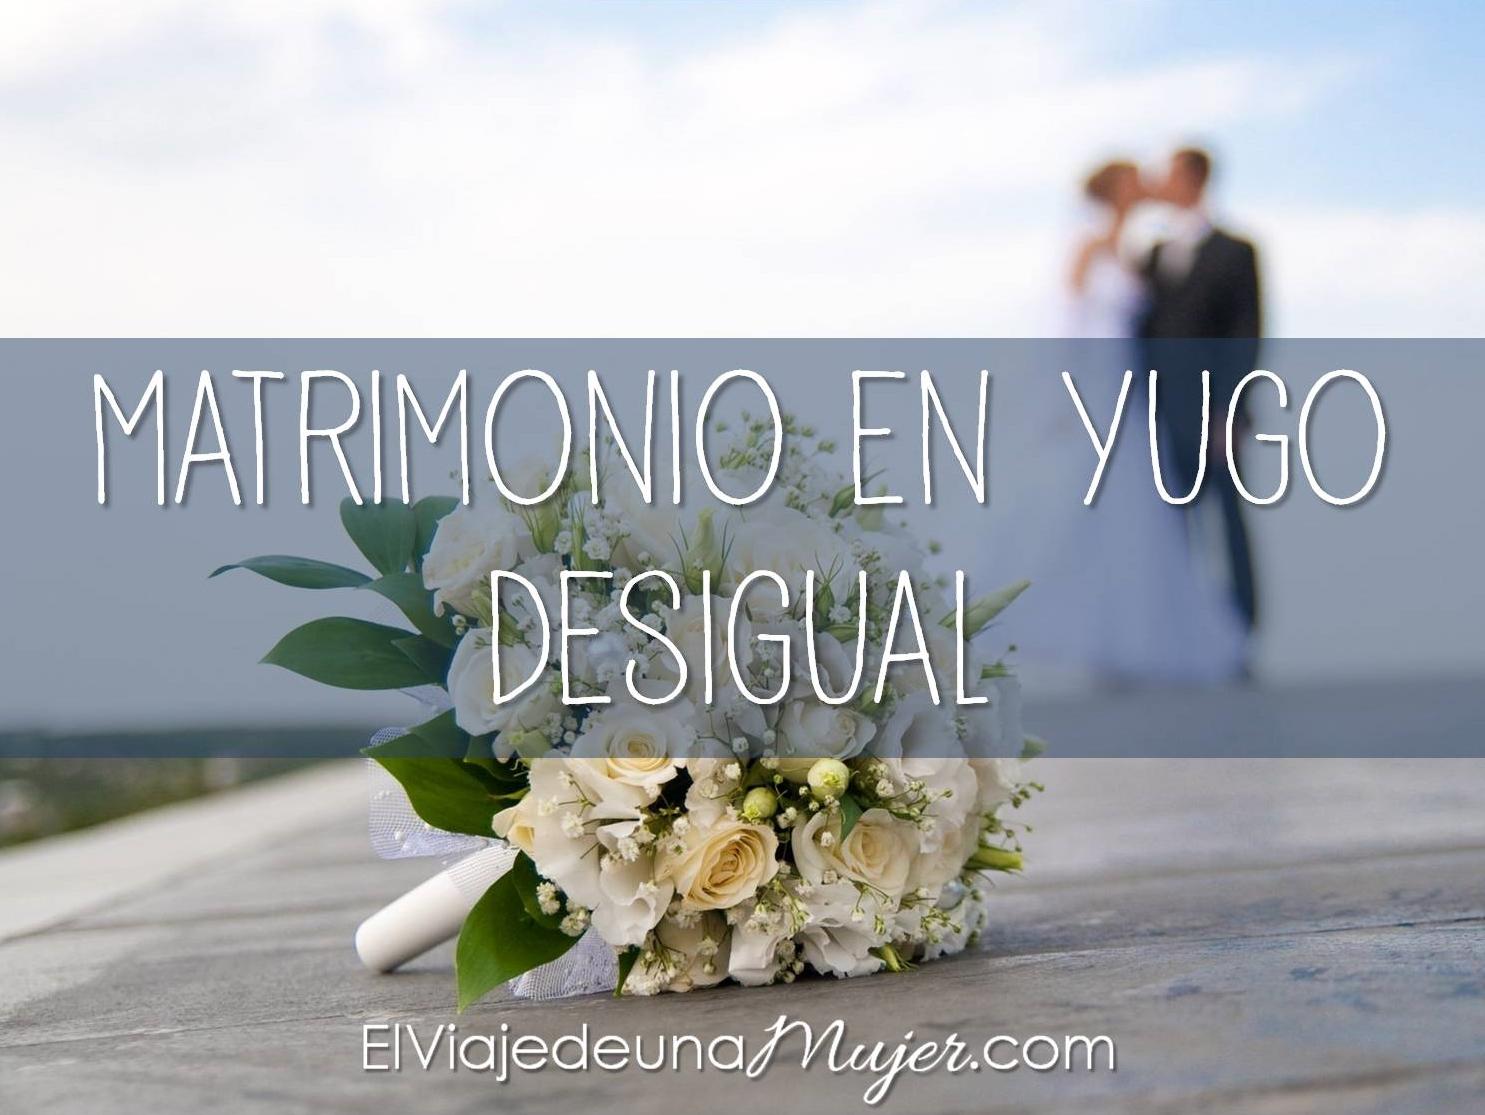 Matrimonio Cristiano Biblia : Matrimonio en yugo desigual